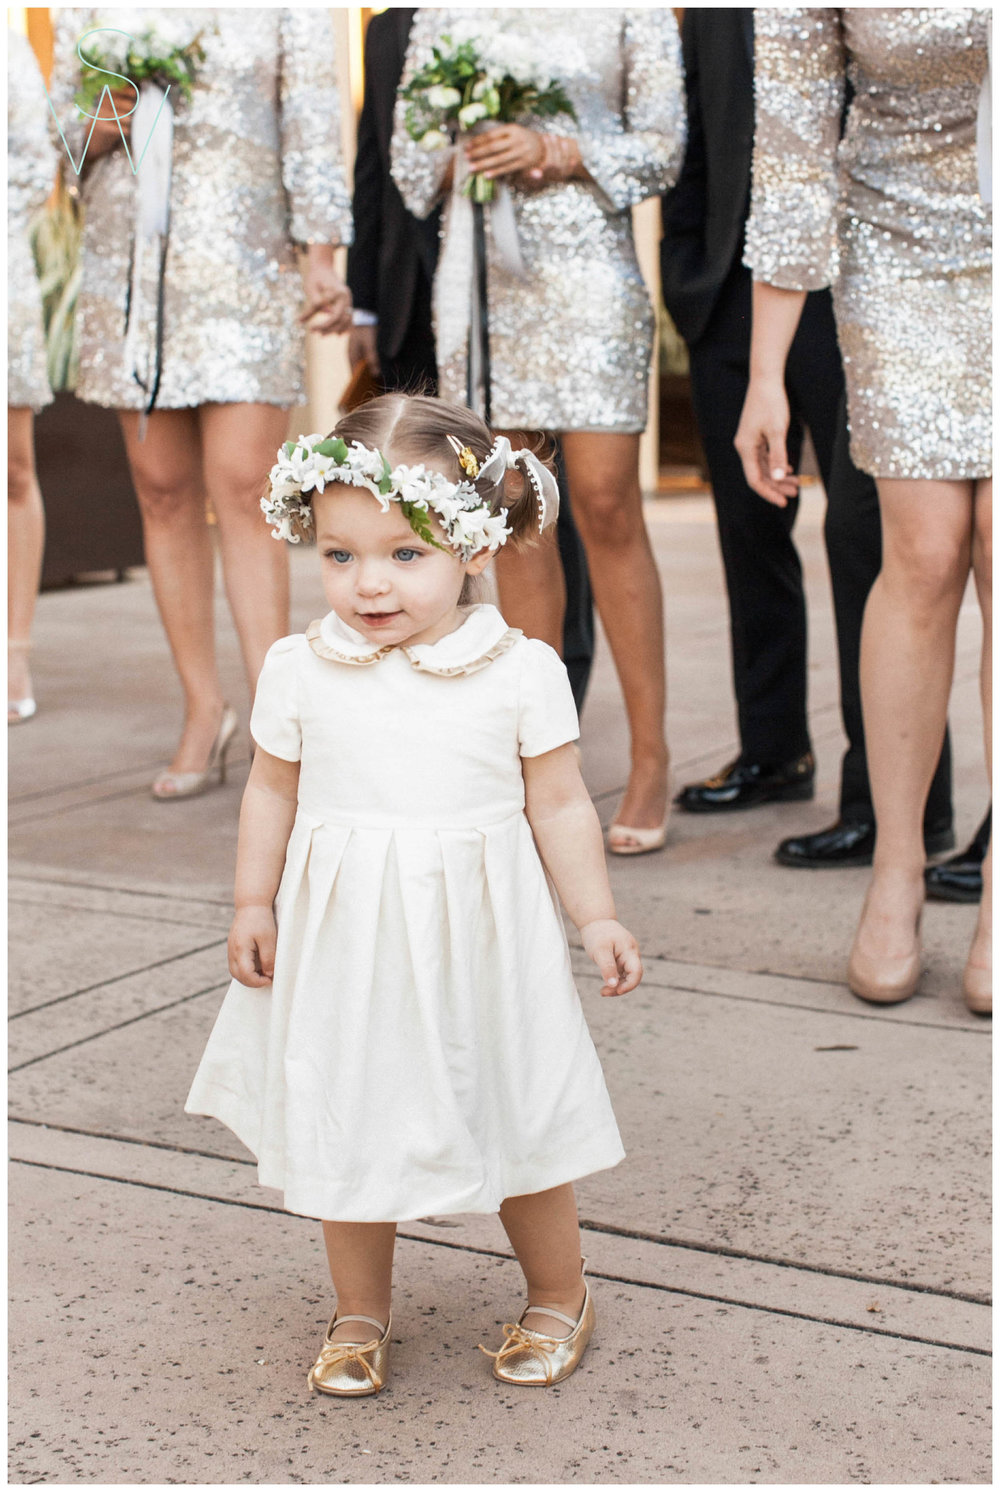 Shewanders.sdma_.wedding.photography-1031.jpg.wedding.photography-1031.jpg